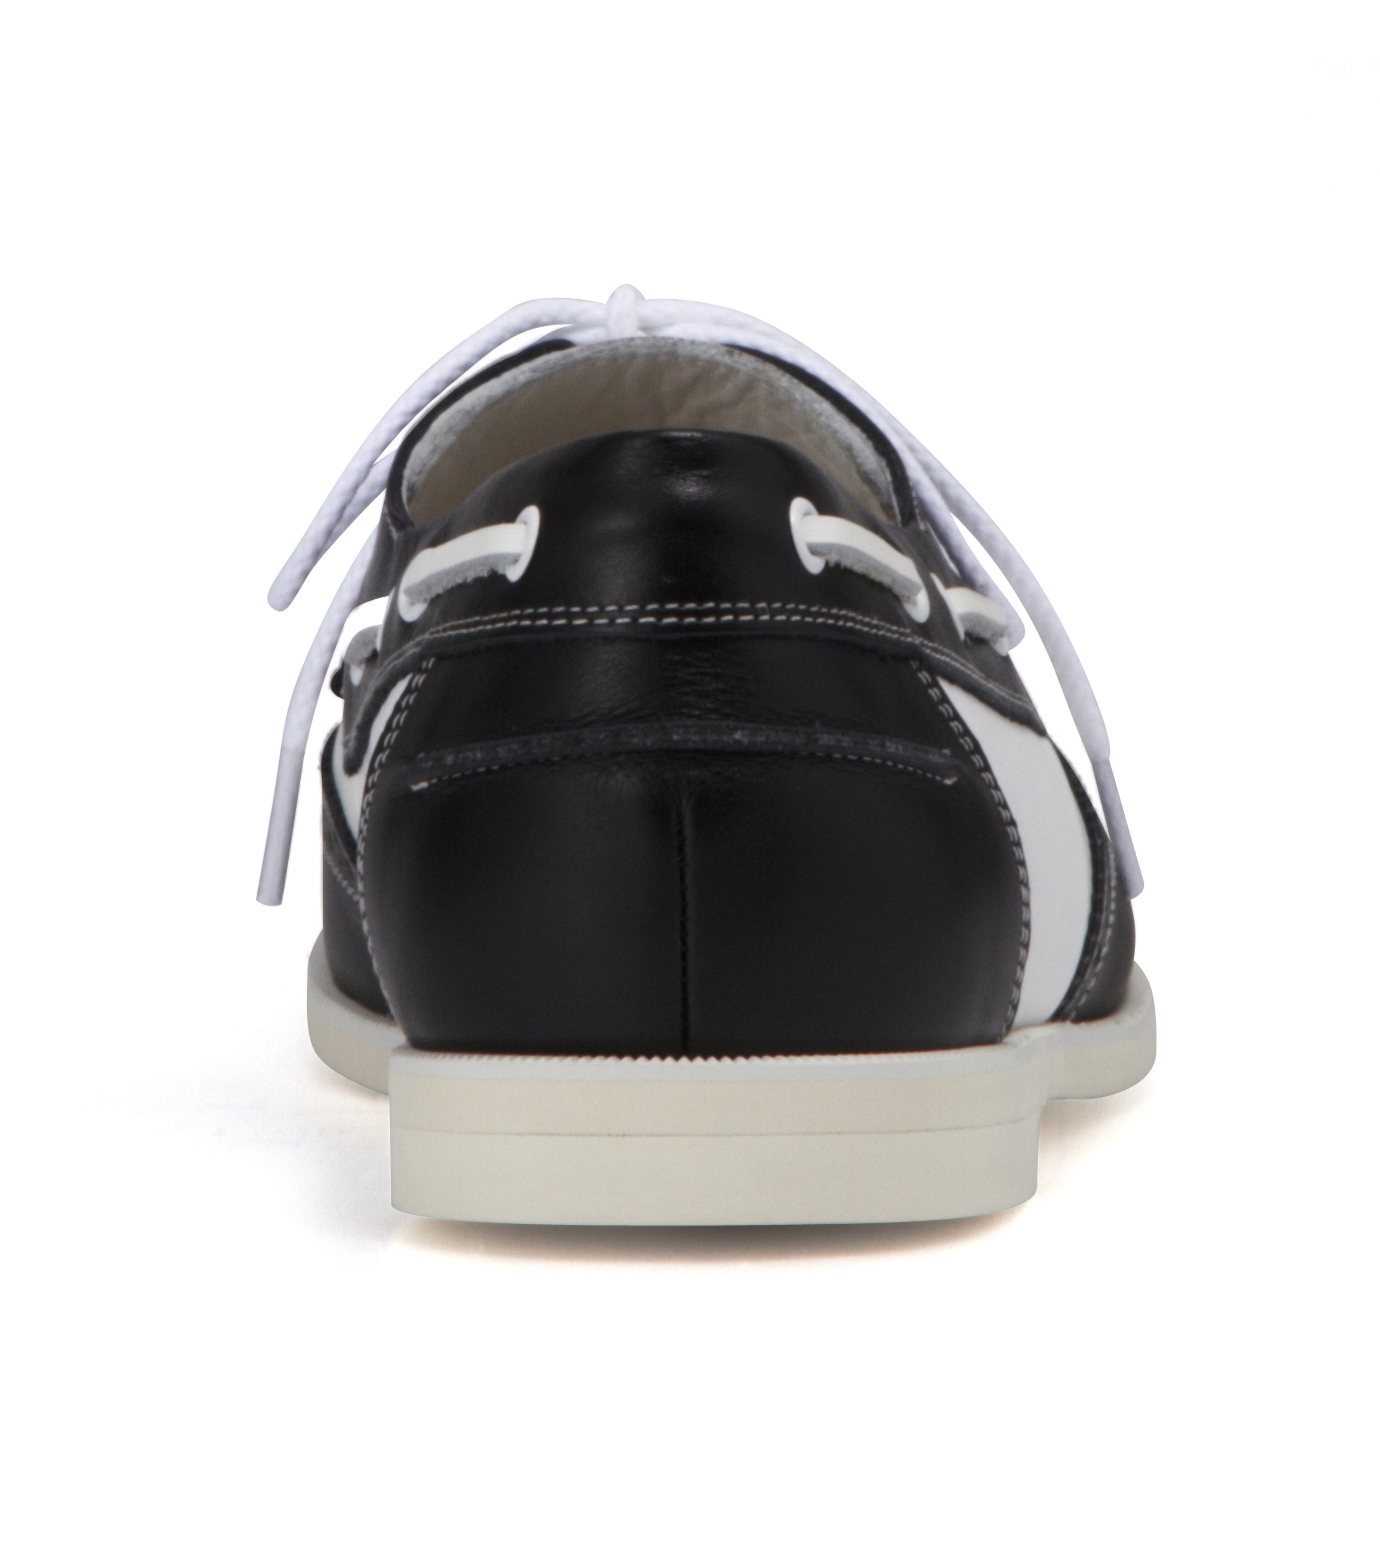 Miharayasuhiro(ミハラヤスヒロ)のHalf Deck Shoes-BLACK-53250500 拡大詳細画像3